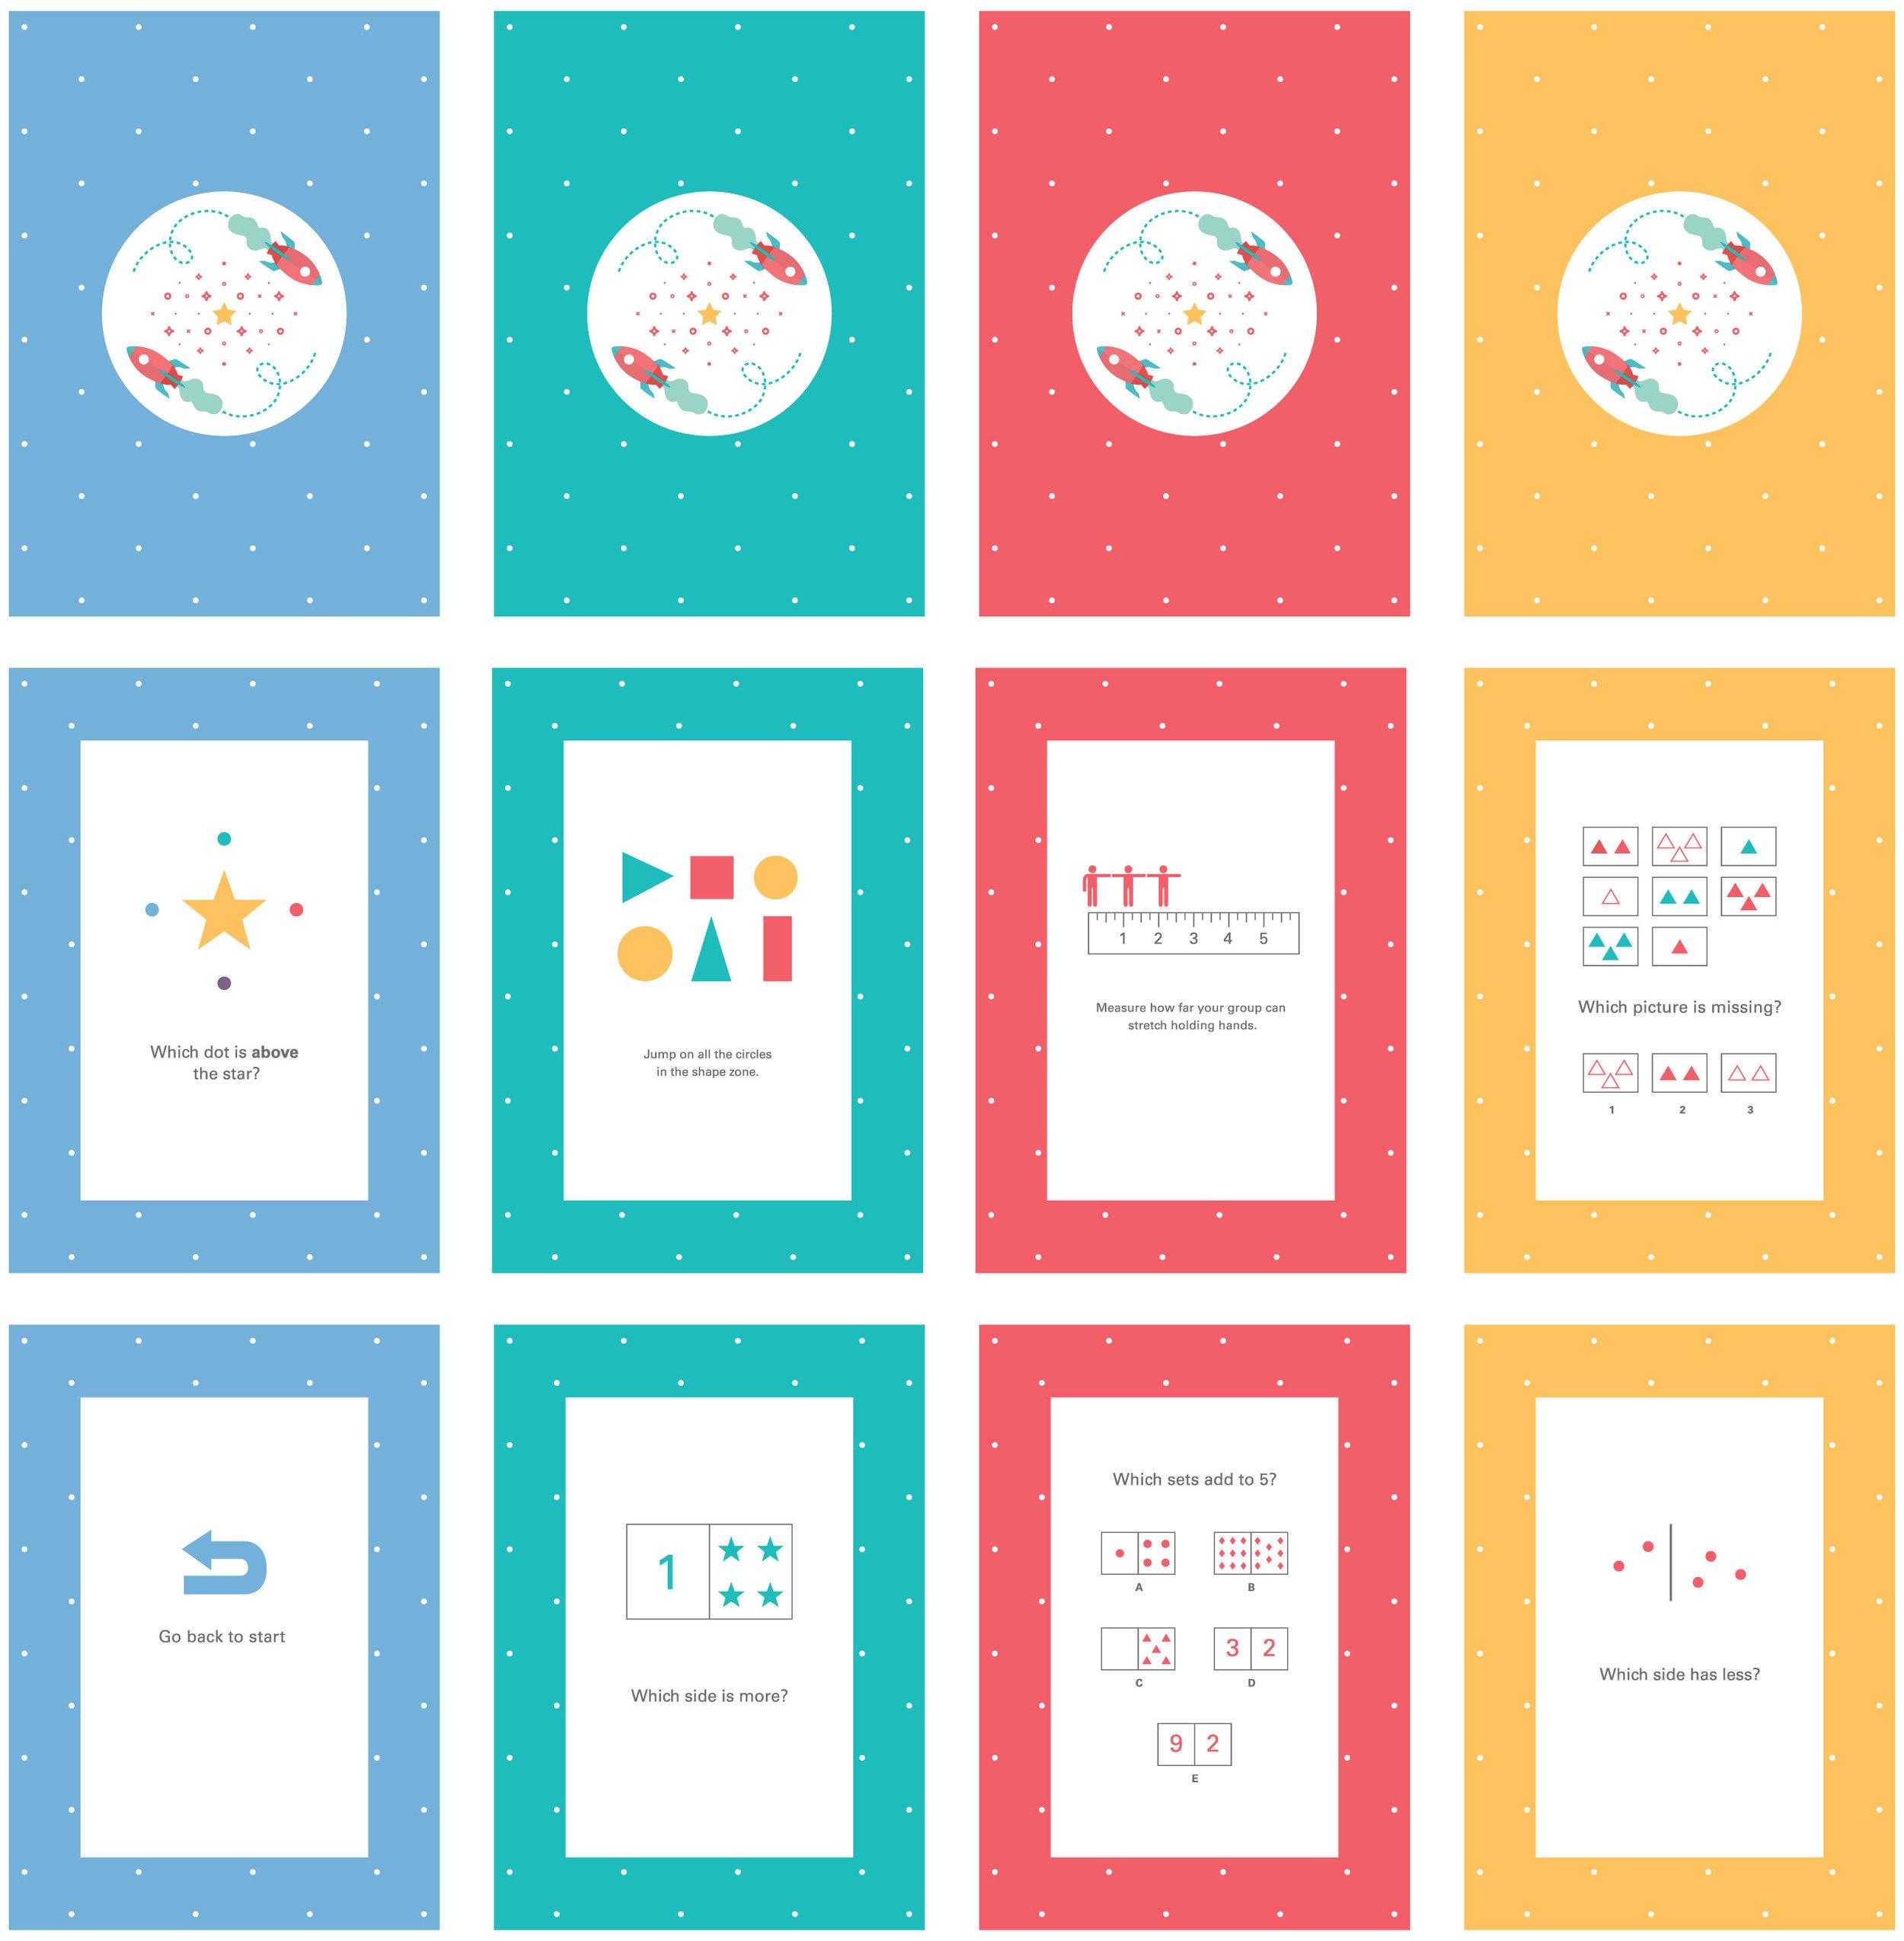 wap-cards.jpg